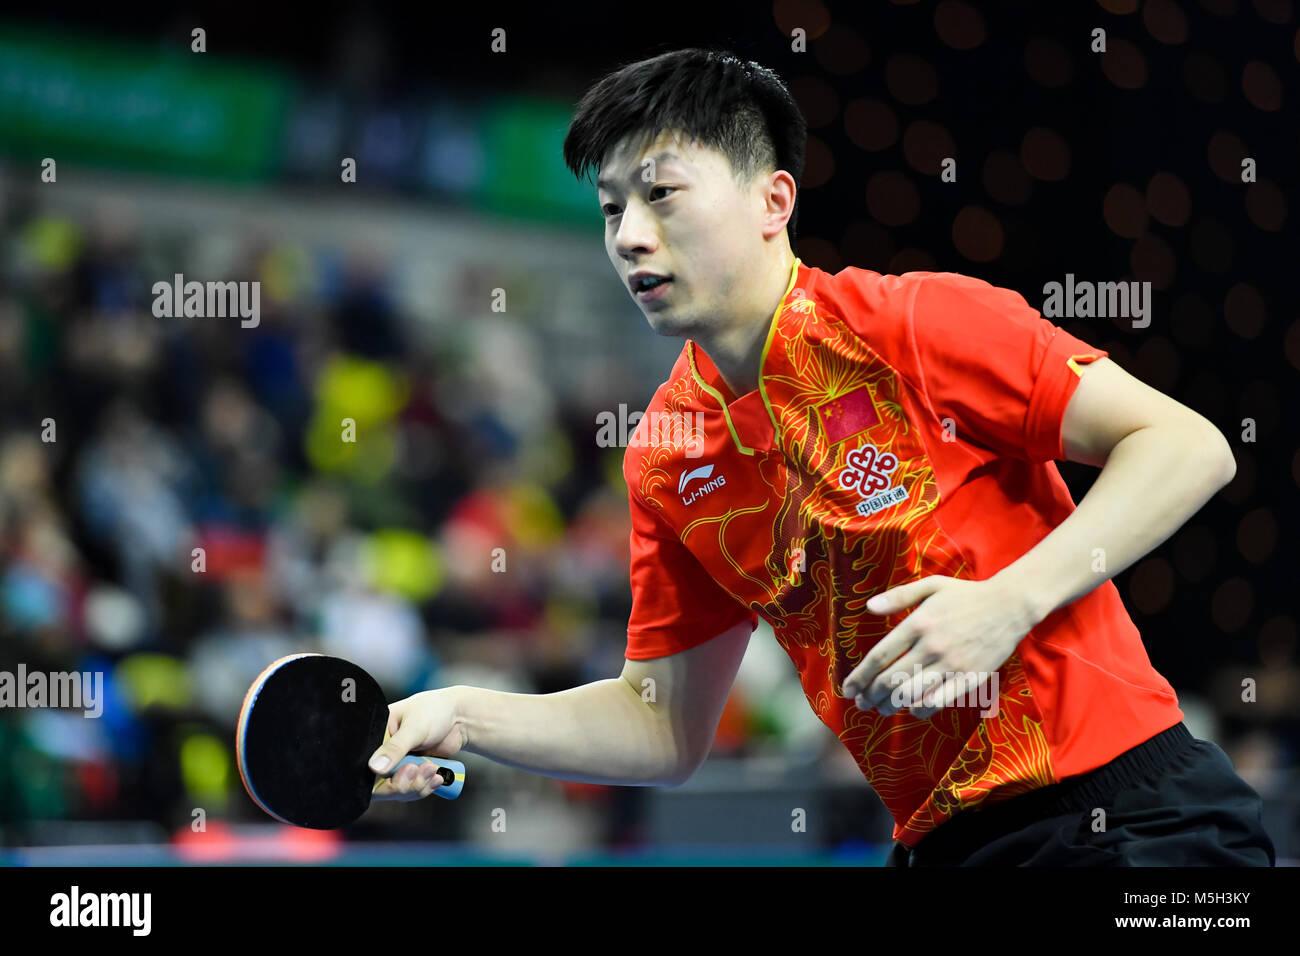 Fantastic China World Cup 2018 - london-uk-23rd-feb-2018-ma-long-of-china-during-international-table-M5H3KY  Photograph_939525 .jpg